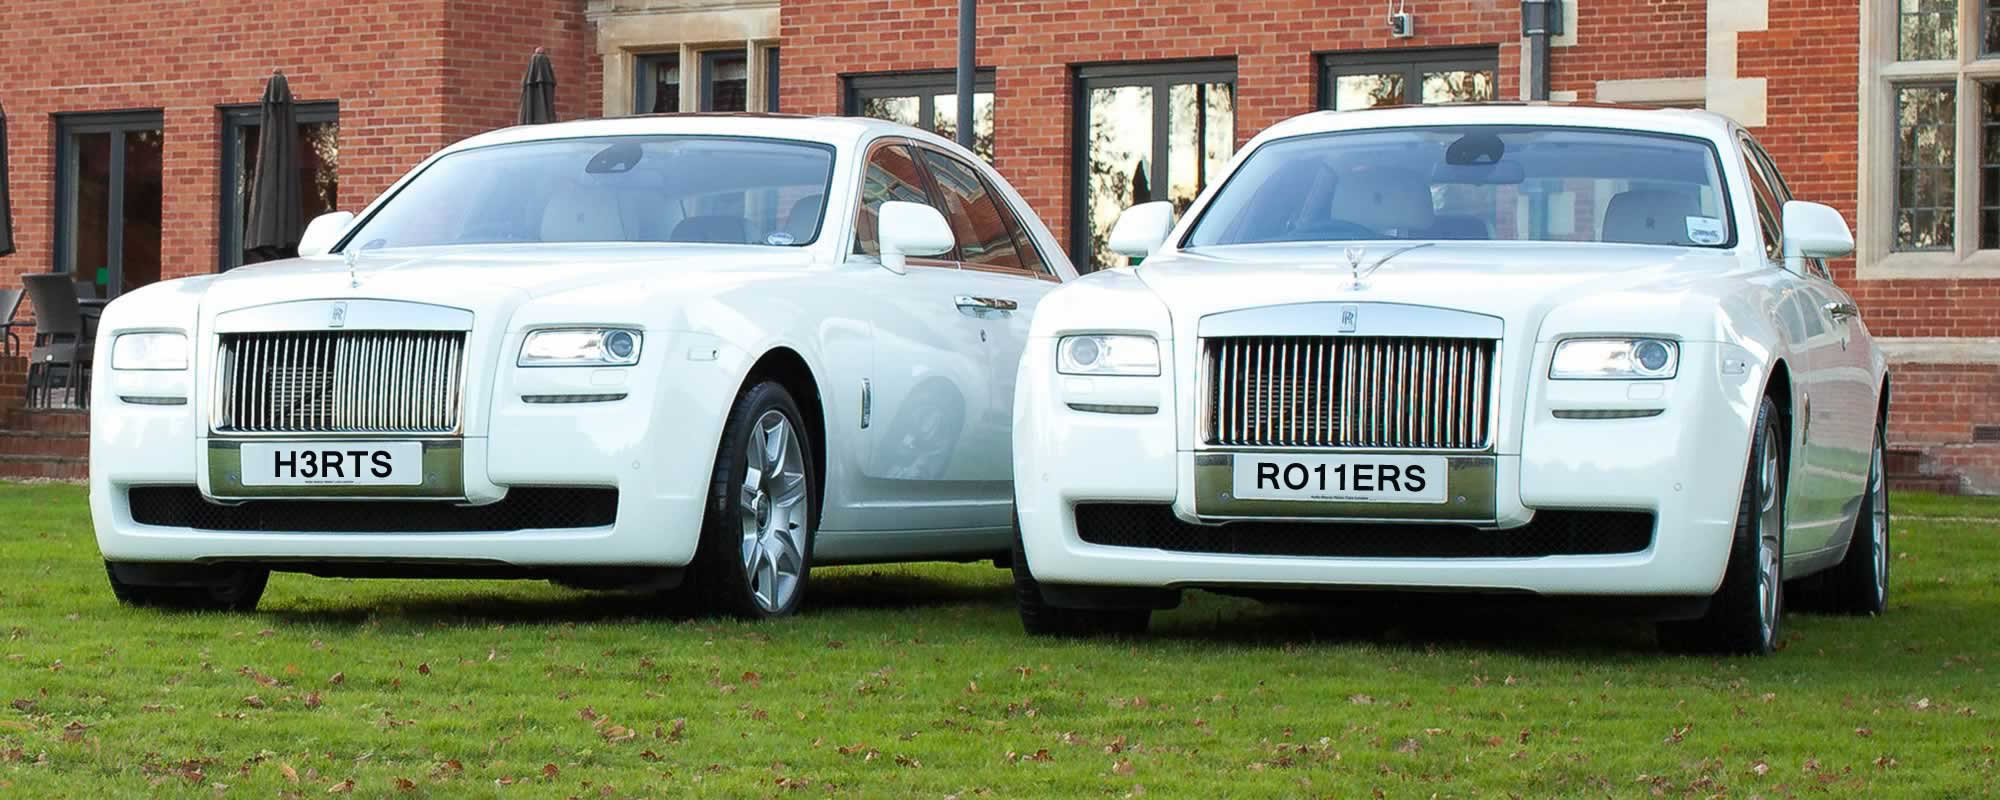 white Rolls Royce Ghost Hire London